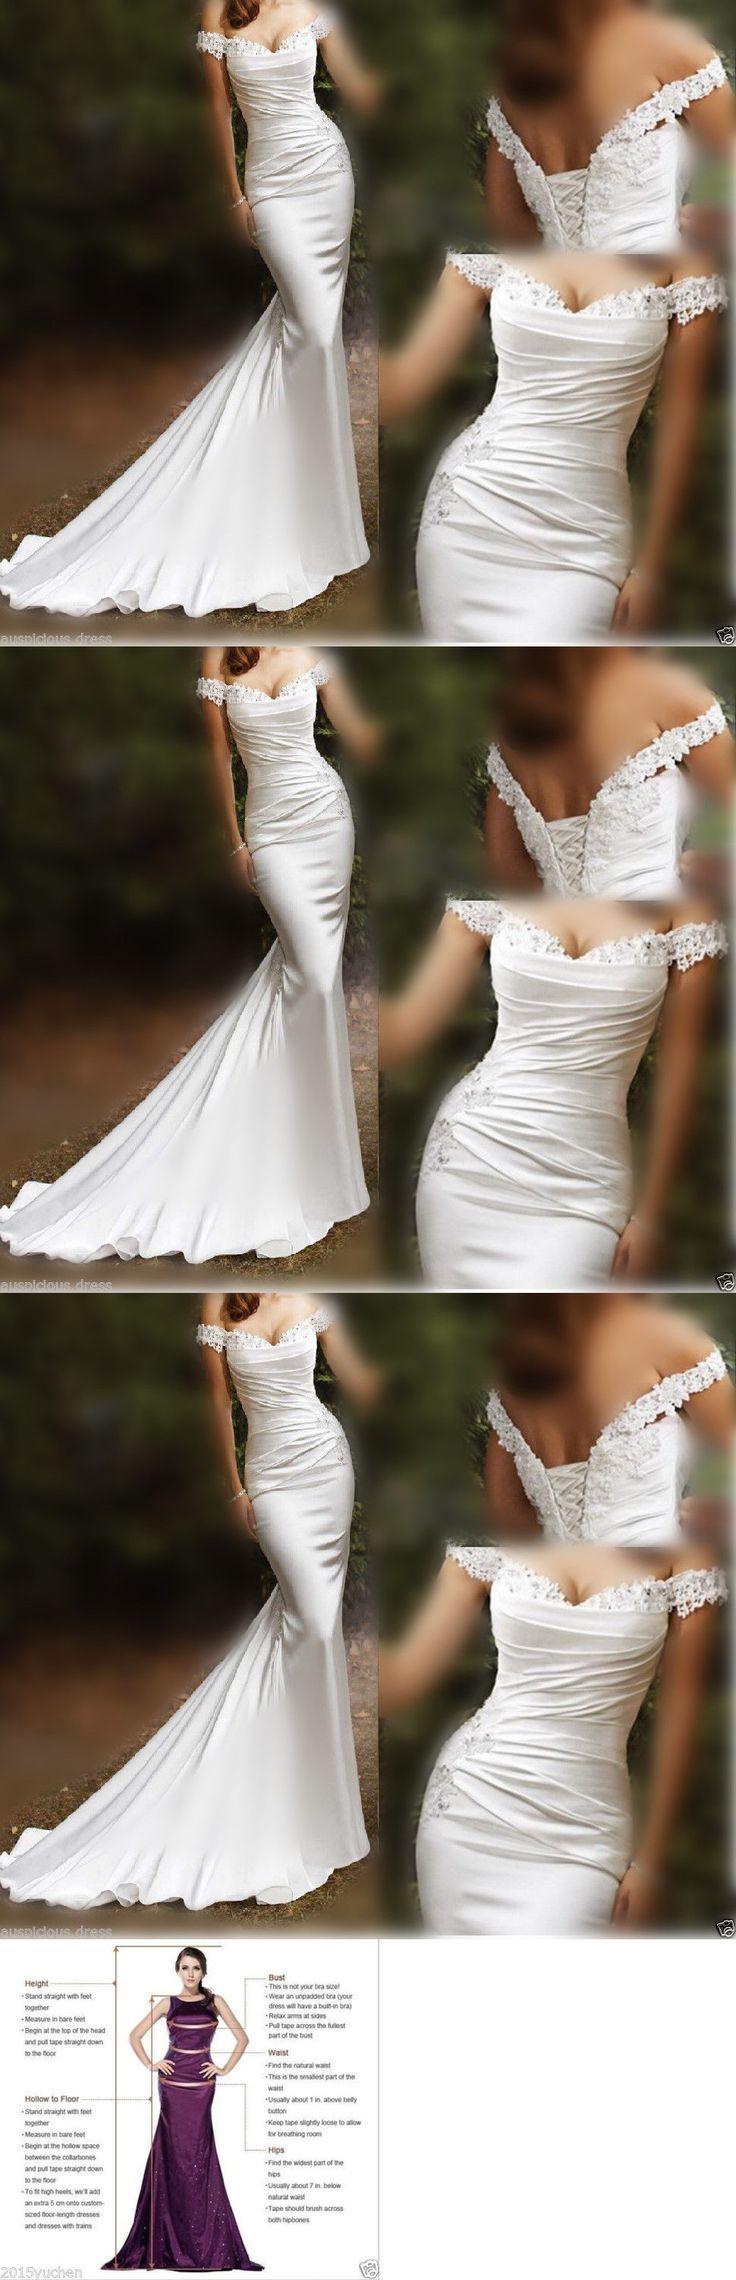 Wedding Dresses: Mermaid White Ivory Wedding Dress Bridal Gown Custom Size 6 8 10 12 14 16 18 20+ -> BUY IT NOW ONLY: $138 on eBay!